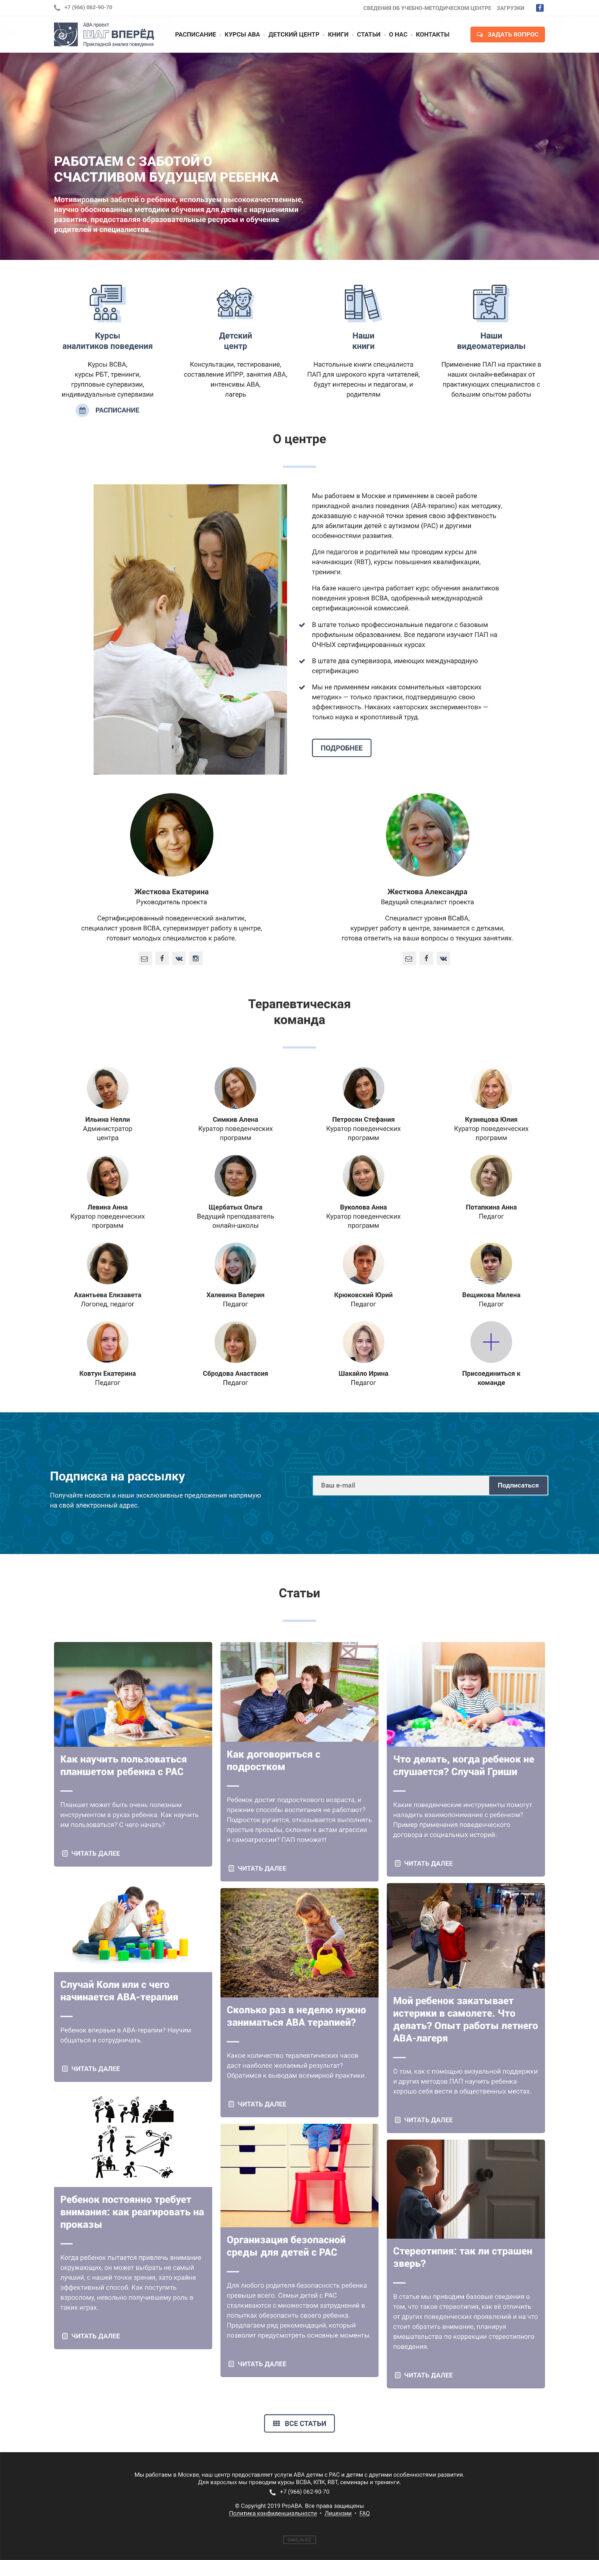 https://danilin.biz/wp-content/uploads/2021/02/proaba-ru-russian-aba-website-design-development-scaled.jpg